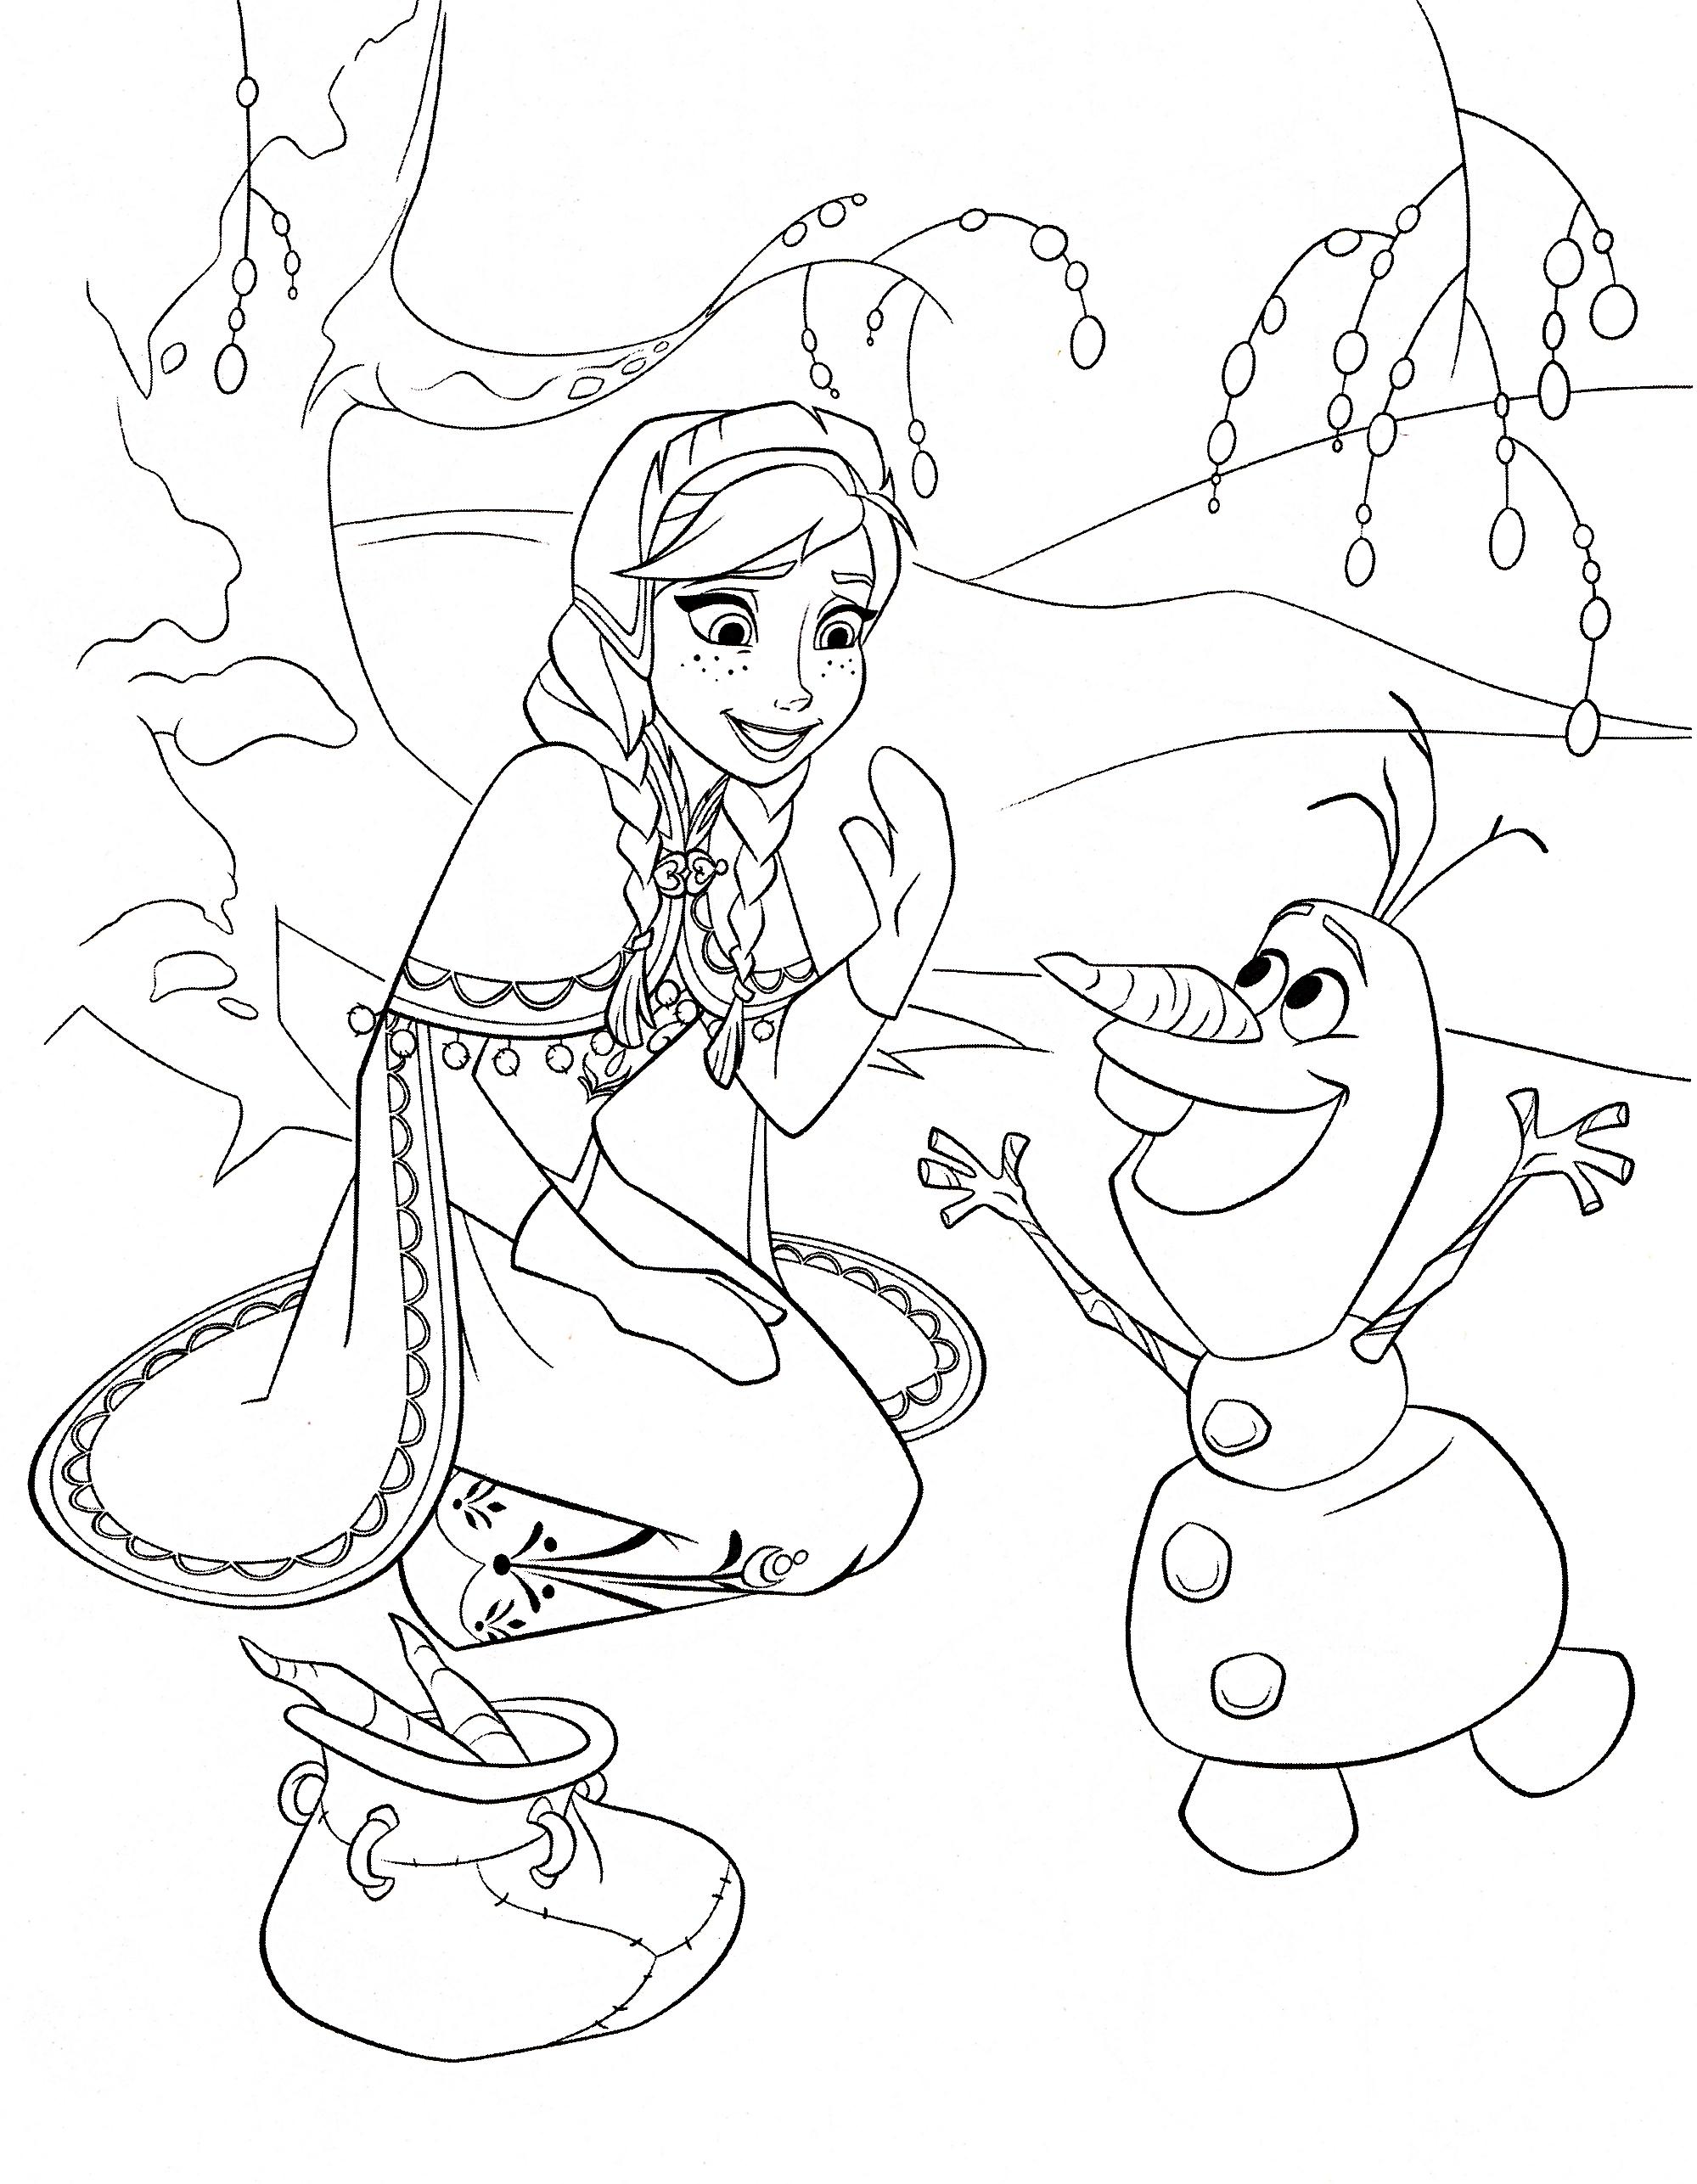 Prince hans frozen coloring pages - Prince Hans Frozen Coloring Pages 53